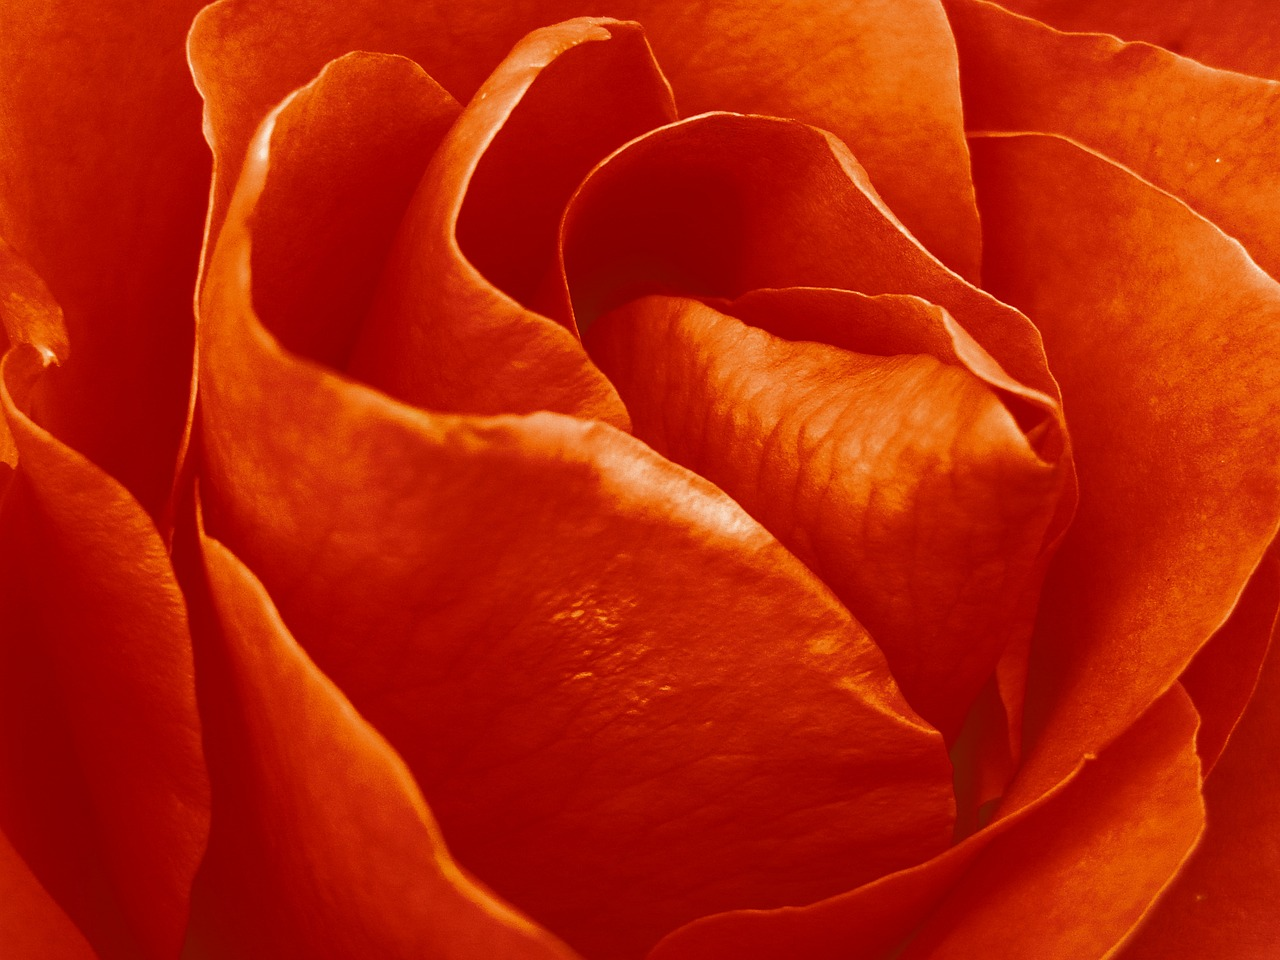 Roseflowersflowernaturewallpaper Free Image From